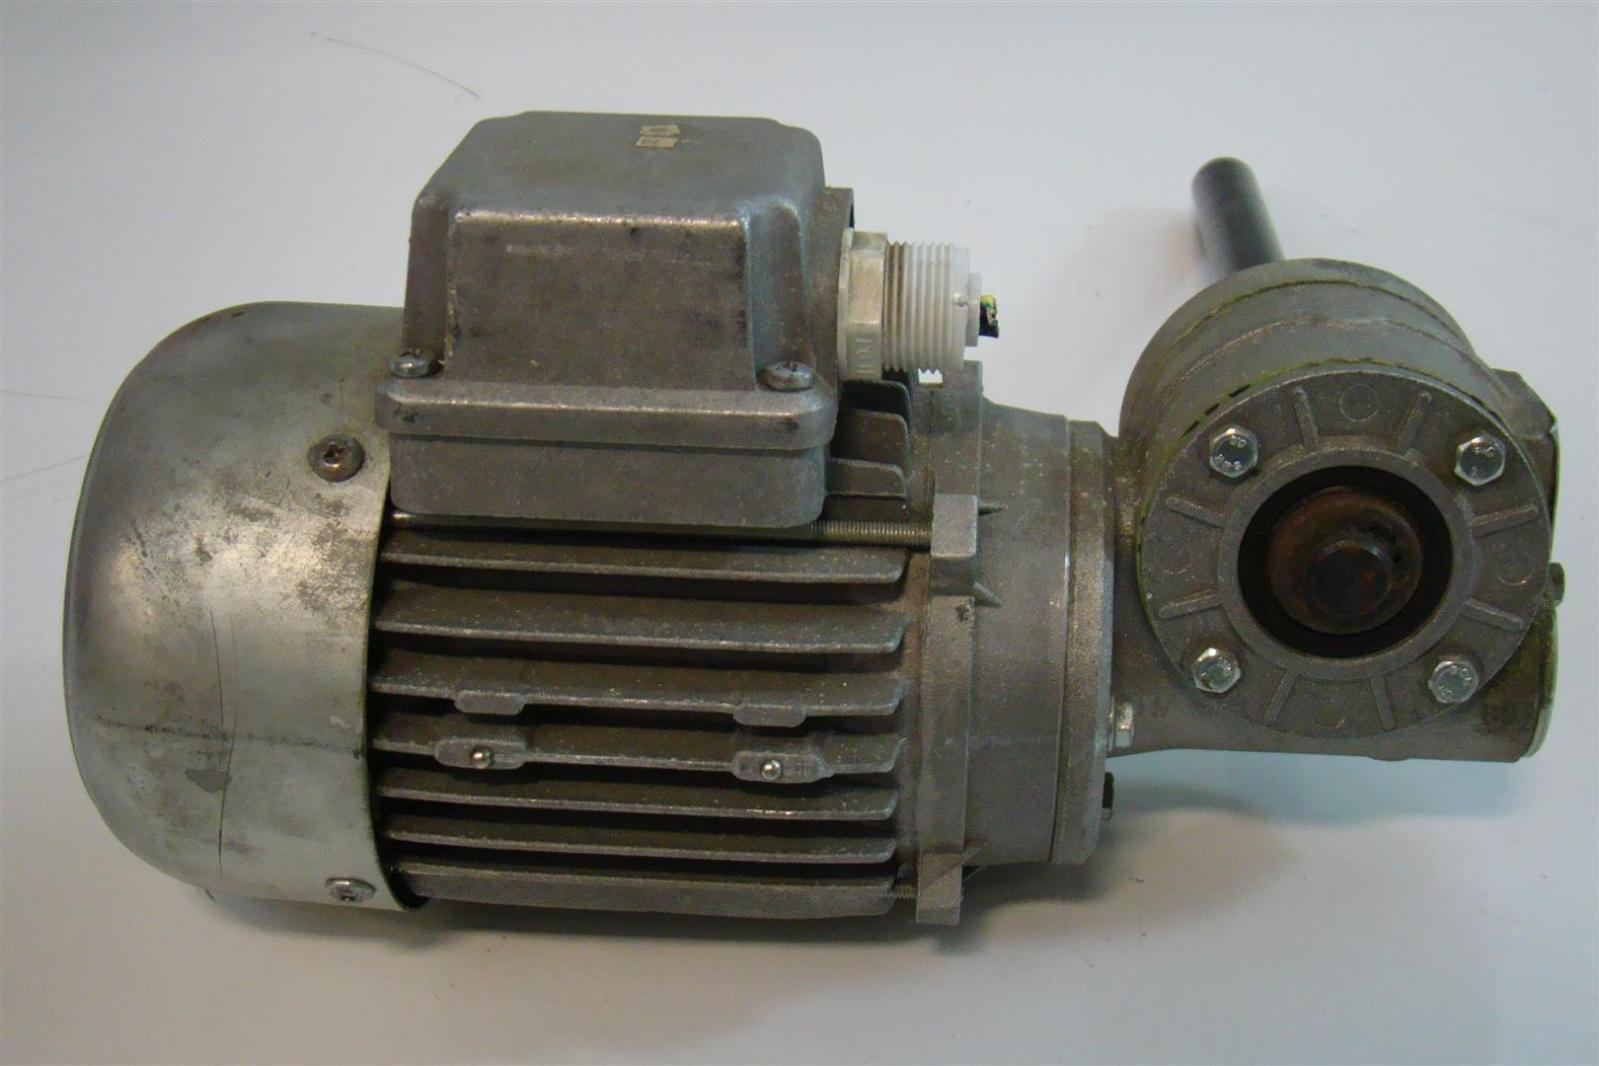 Stm Gear Motor 1 100 2100313021 Rm1 20 P Joseph Fazzio Incorporated